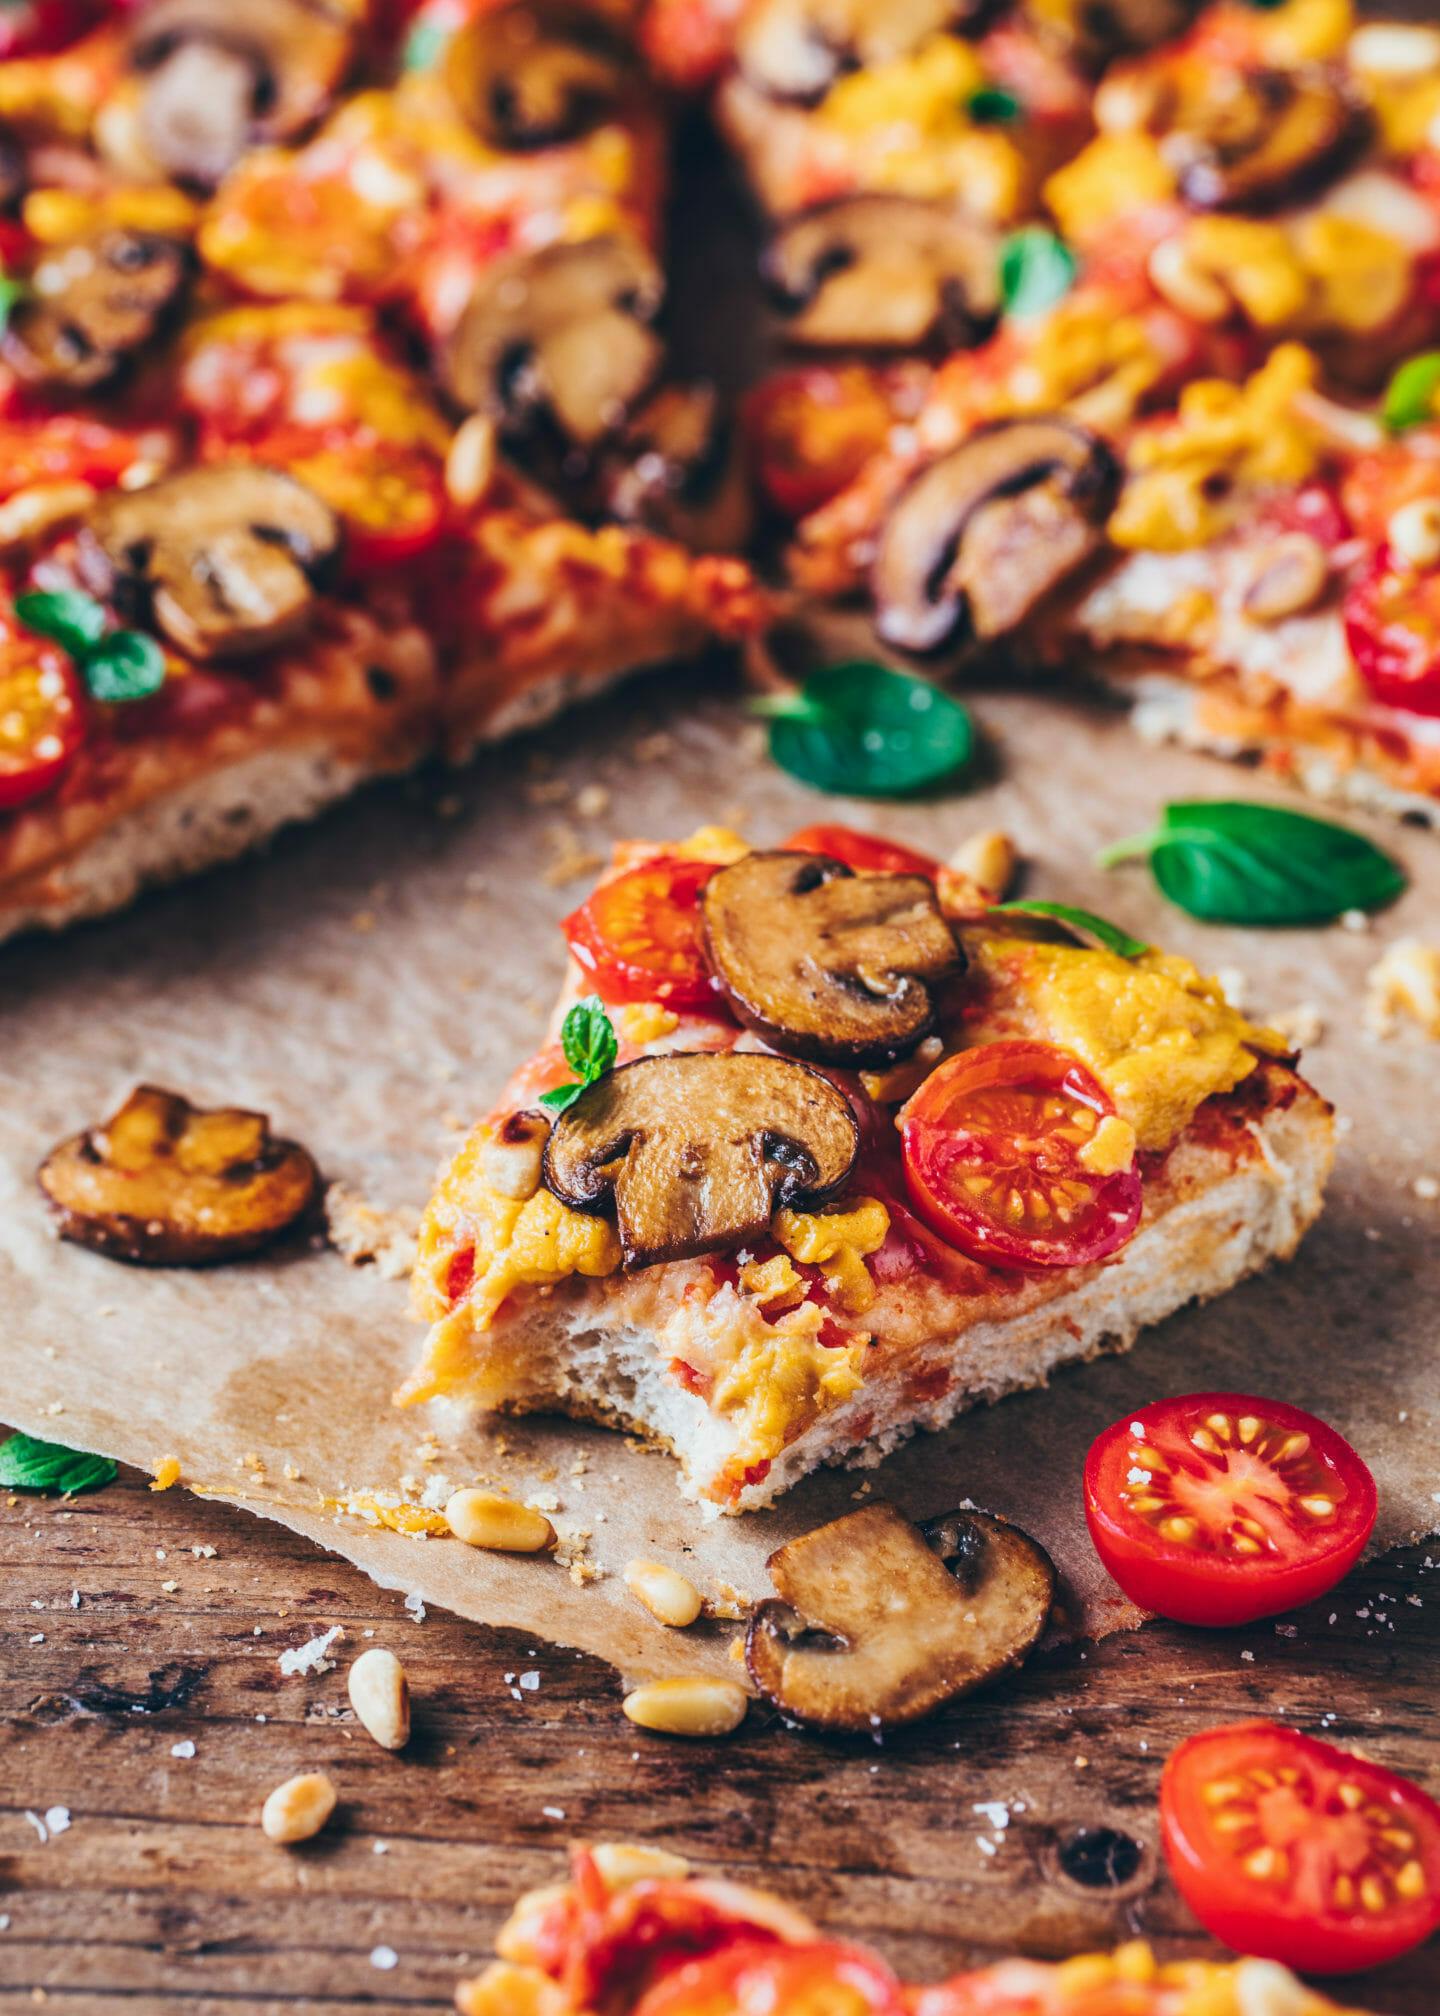 Tomato Mushroom Pizza with grated vegan cheese